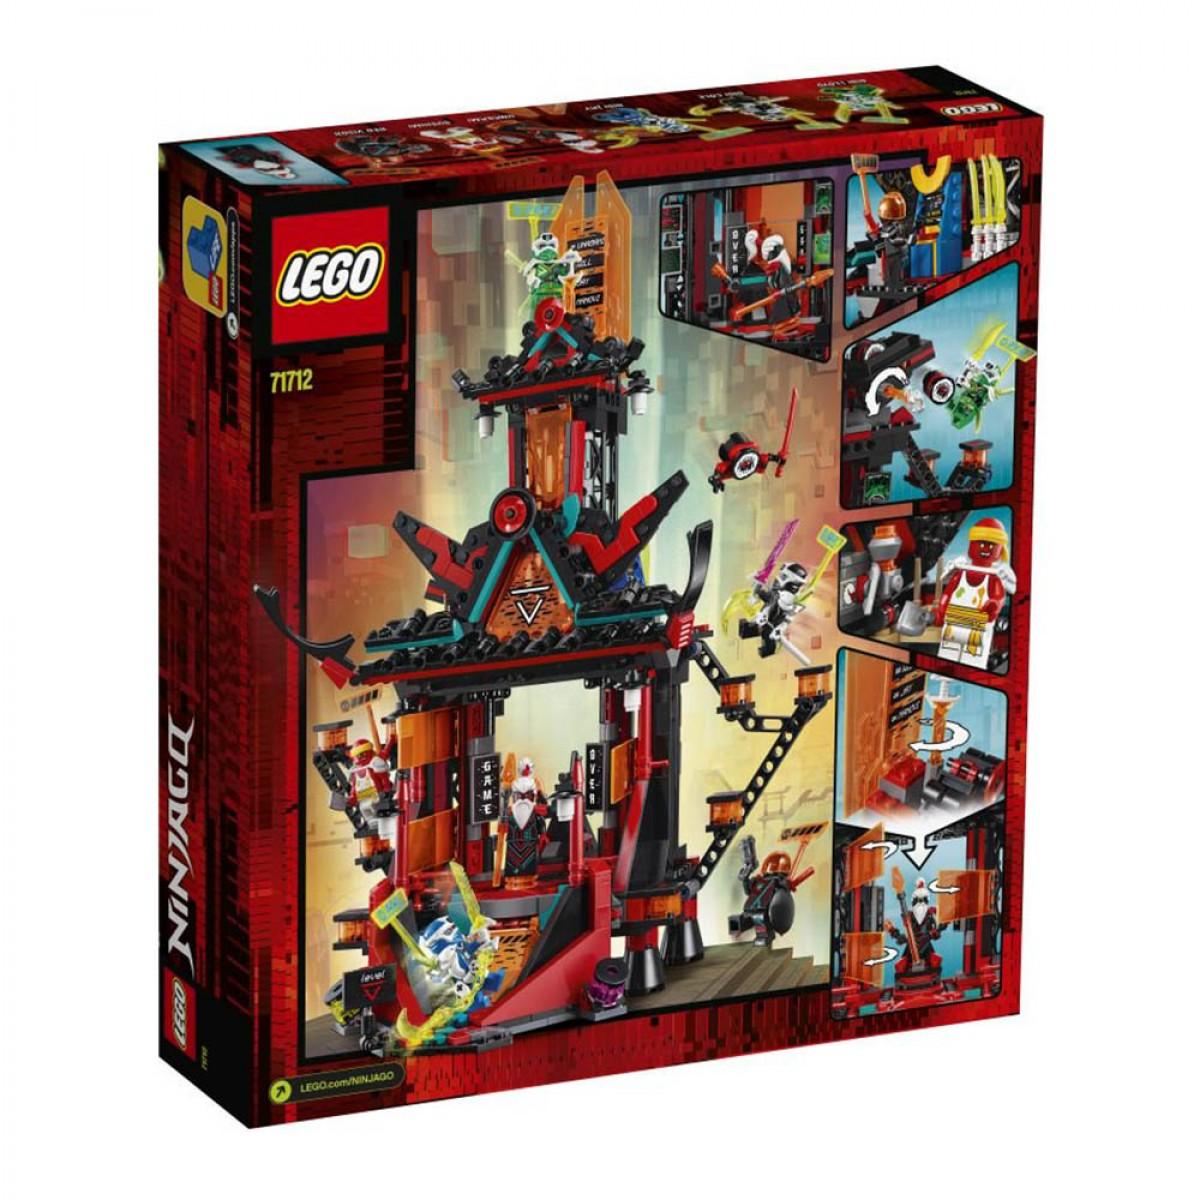 LEGO EMPIRE TEMPLE OF MADNESS 71712